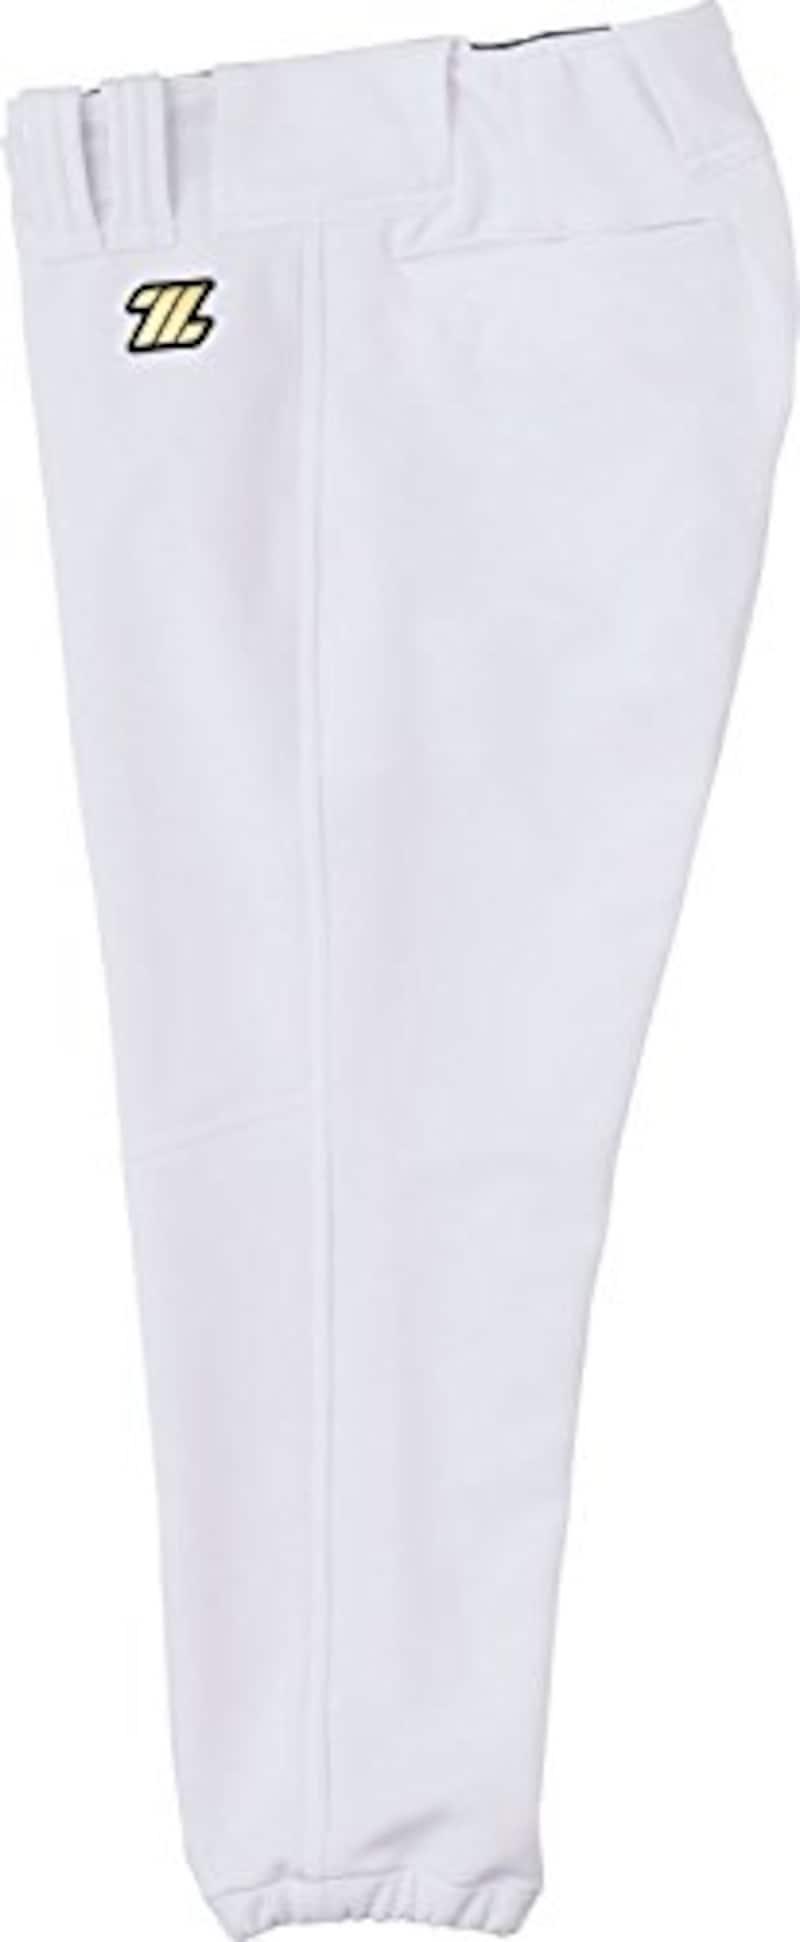 ZETT(ゼット) 野球 少年用 ユニフォーム レギュラー パンツ ヒザ 二重 補強 メカパン BU2182P